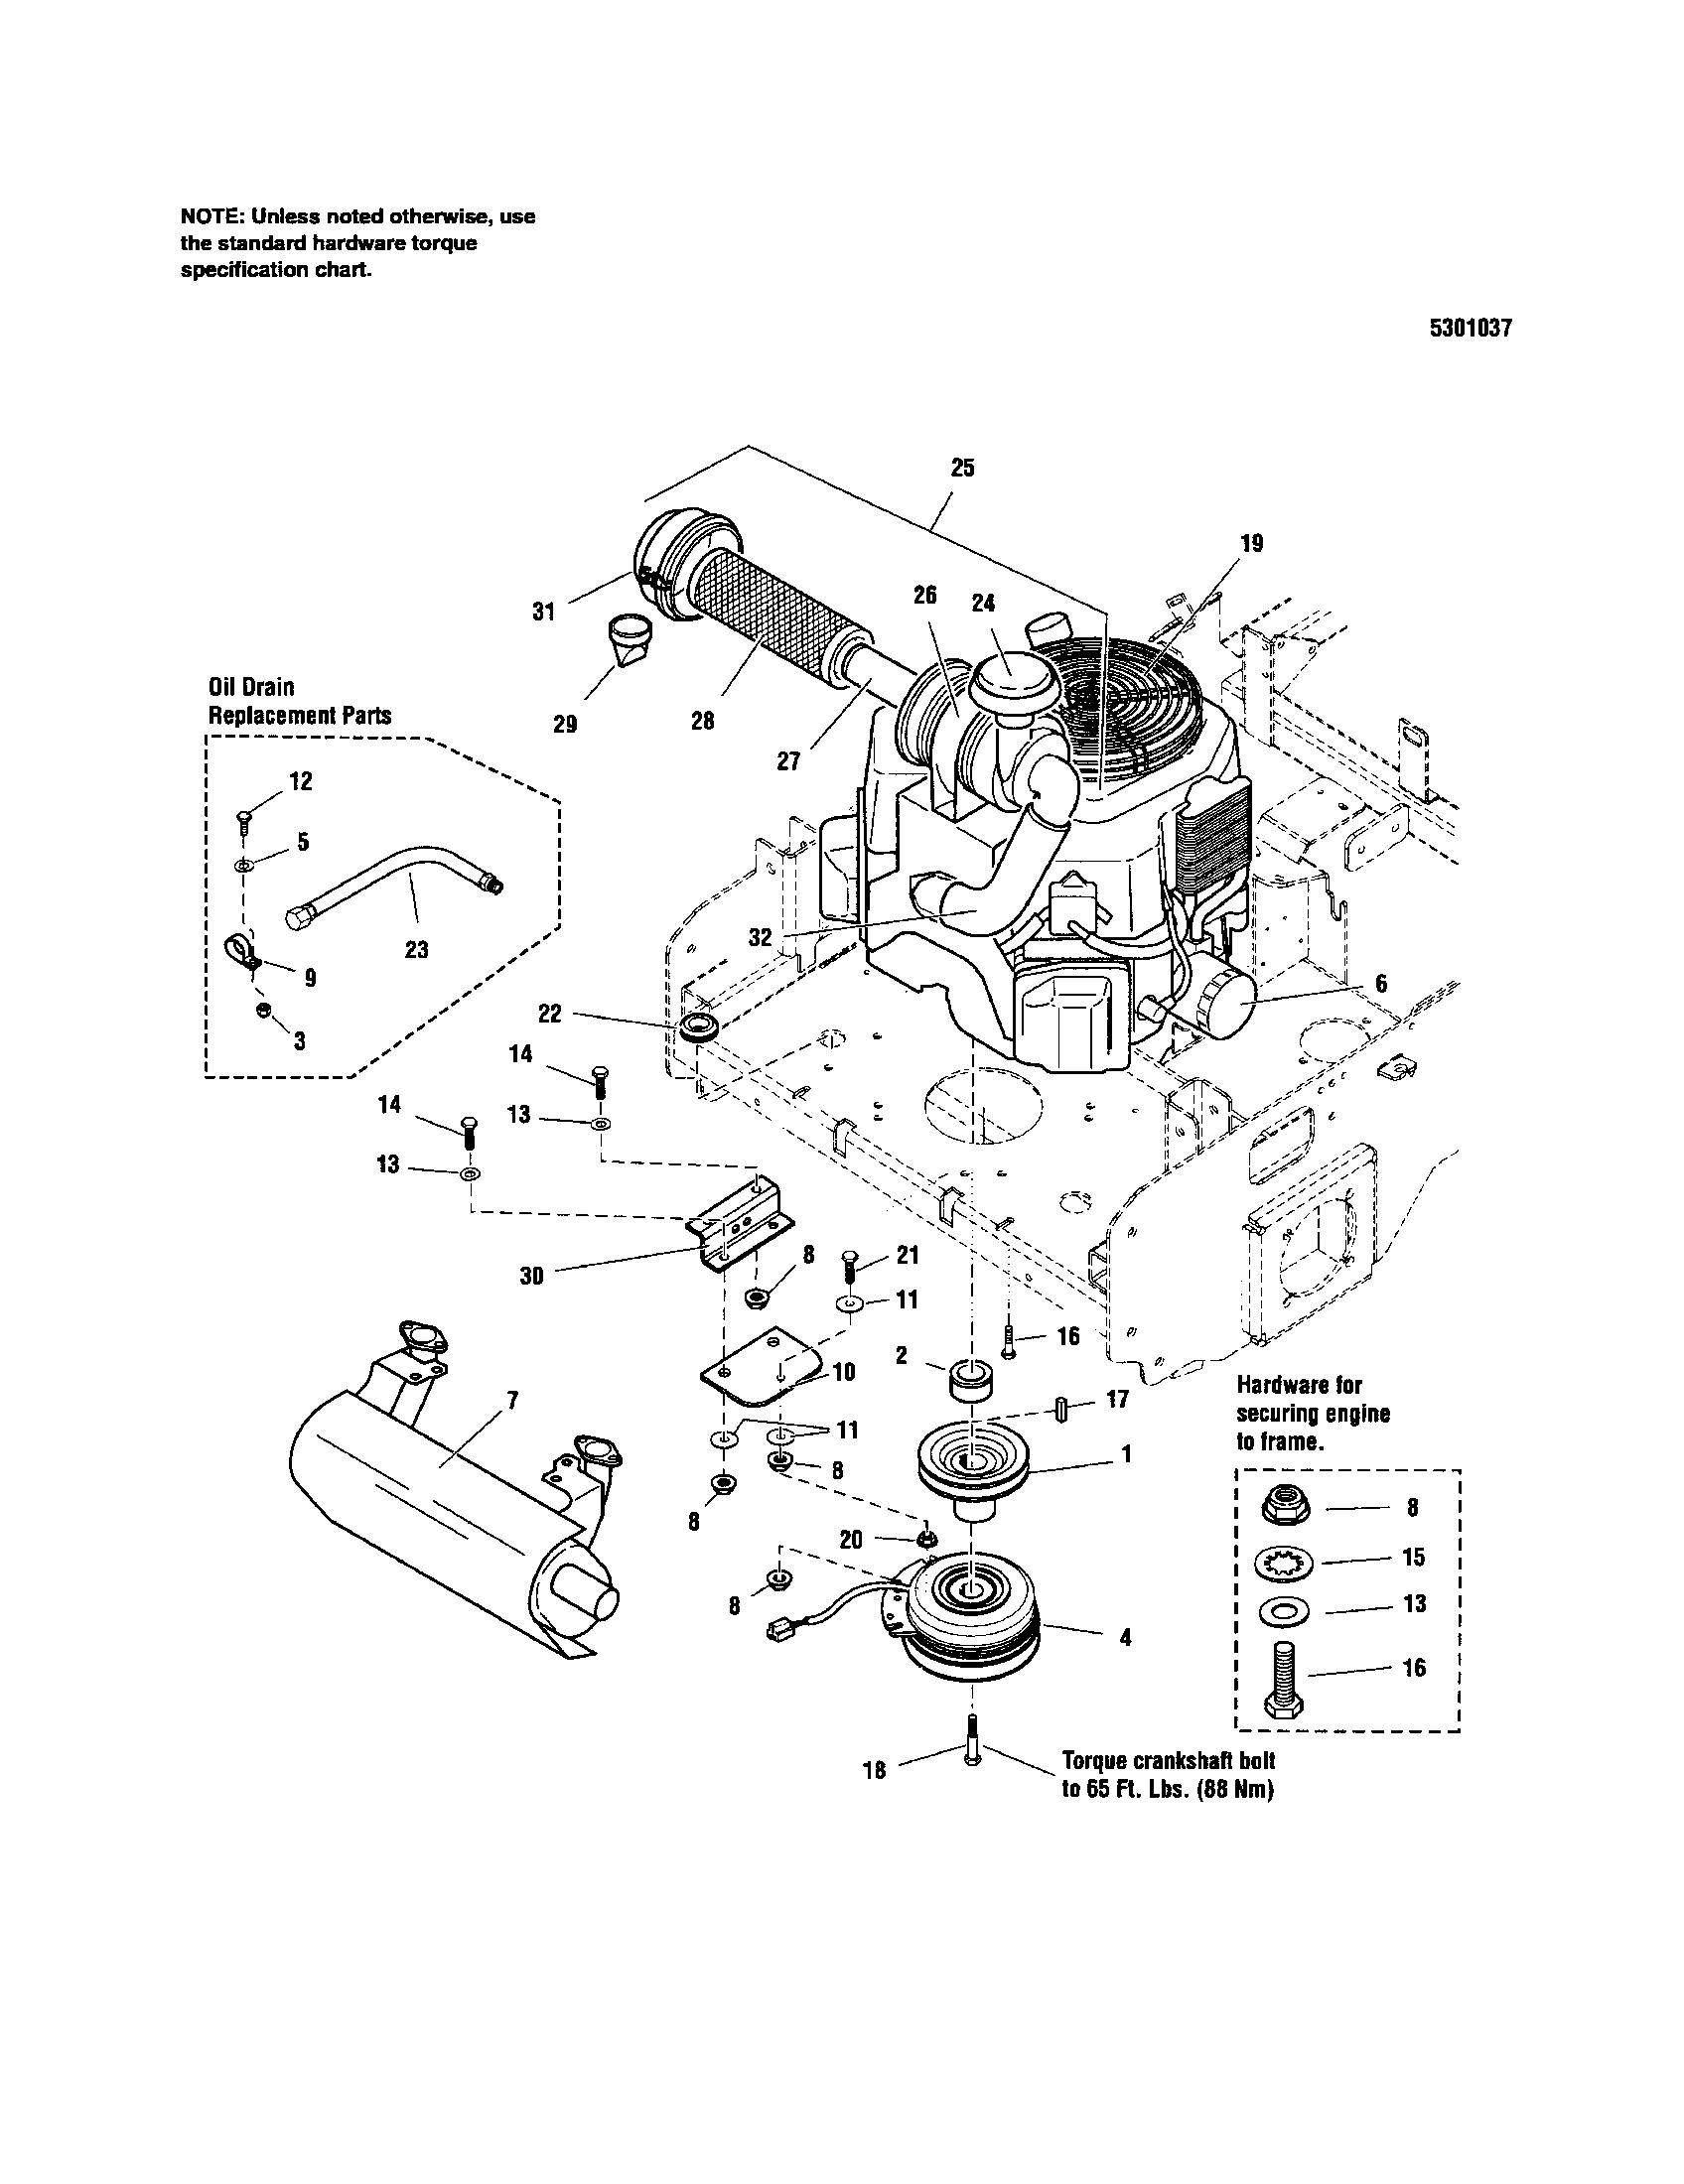 Riding Mower Engine Diagram | Wiring Library - Kohler Engine Wiring Diagram